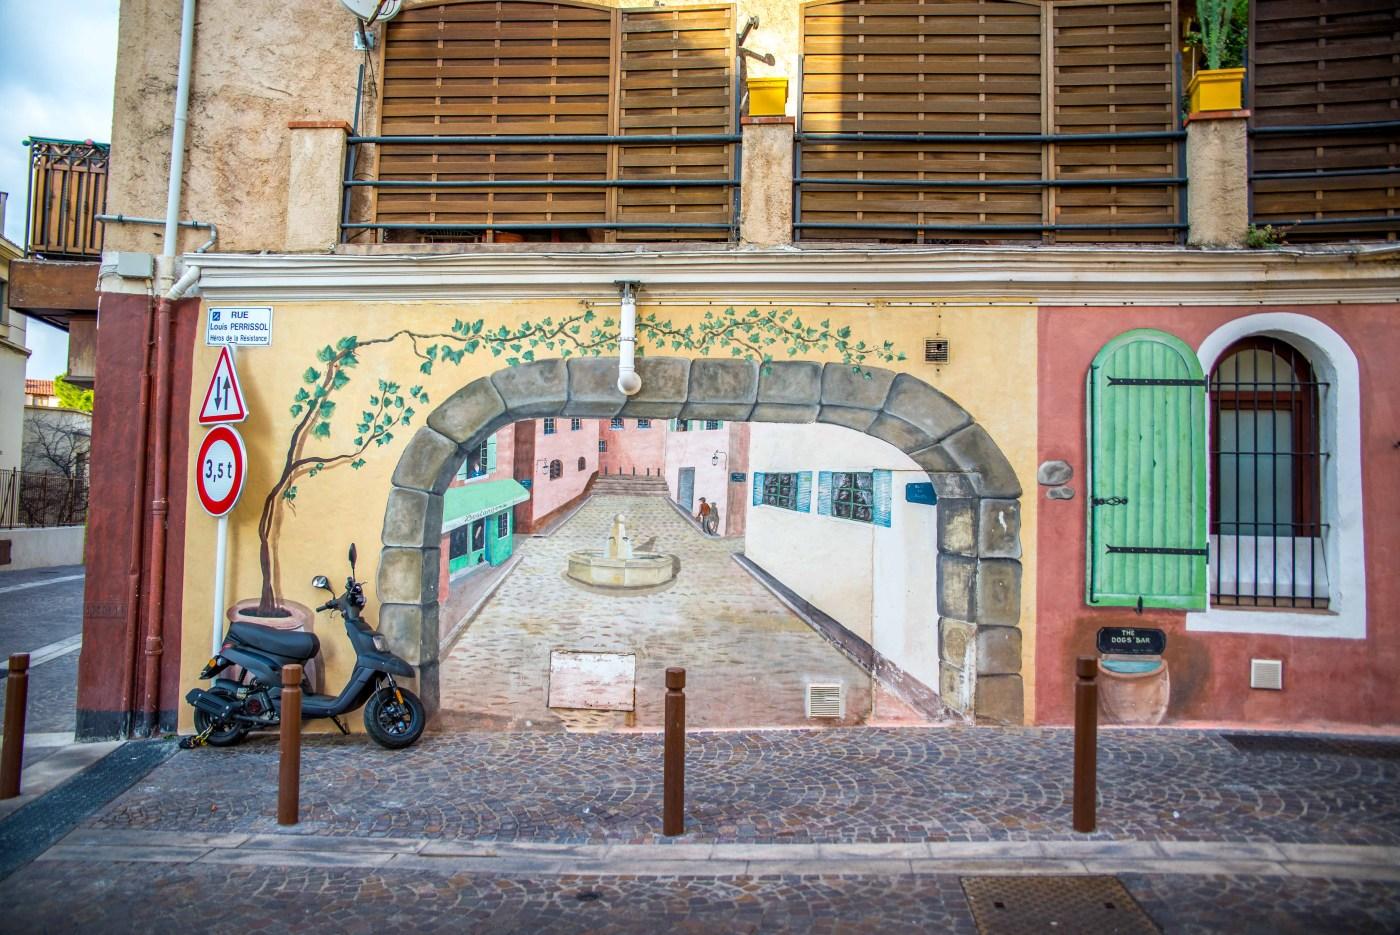 cannes streetart murales paca provences alpes cote d'azur urbanart blog blogvoyage icietlabas (8)